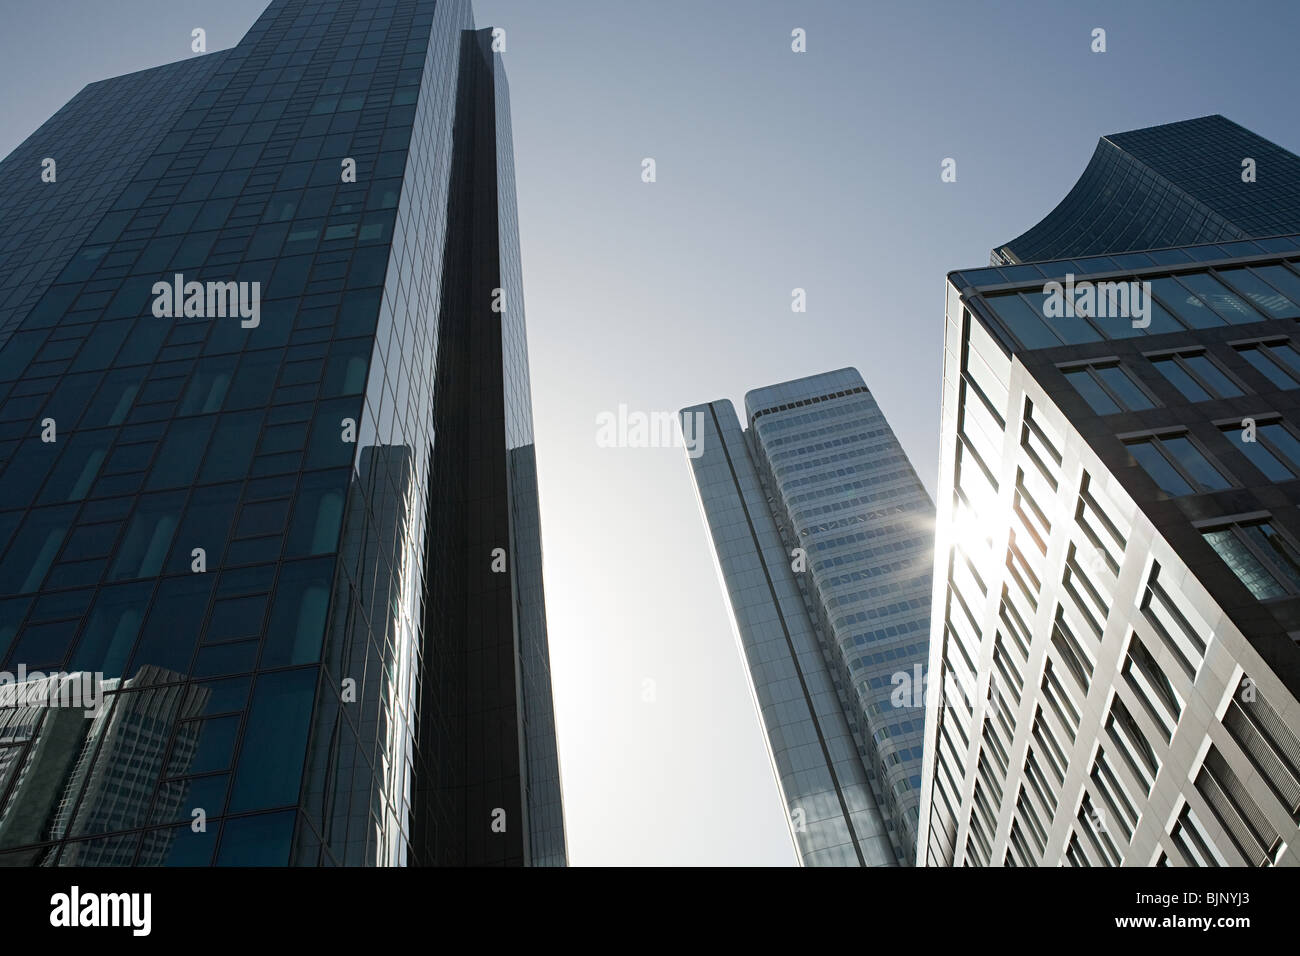 Office buildings in frankfurt - Stock Image